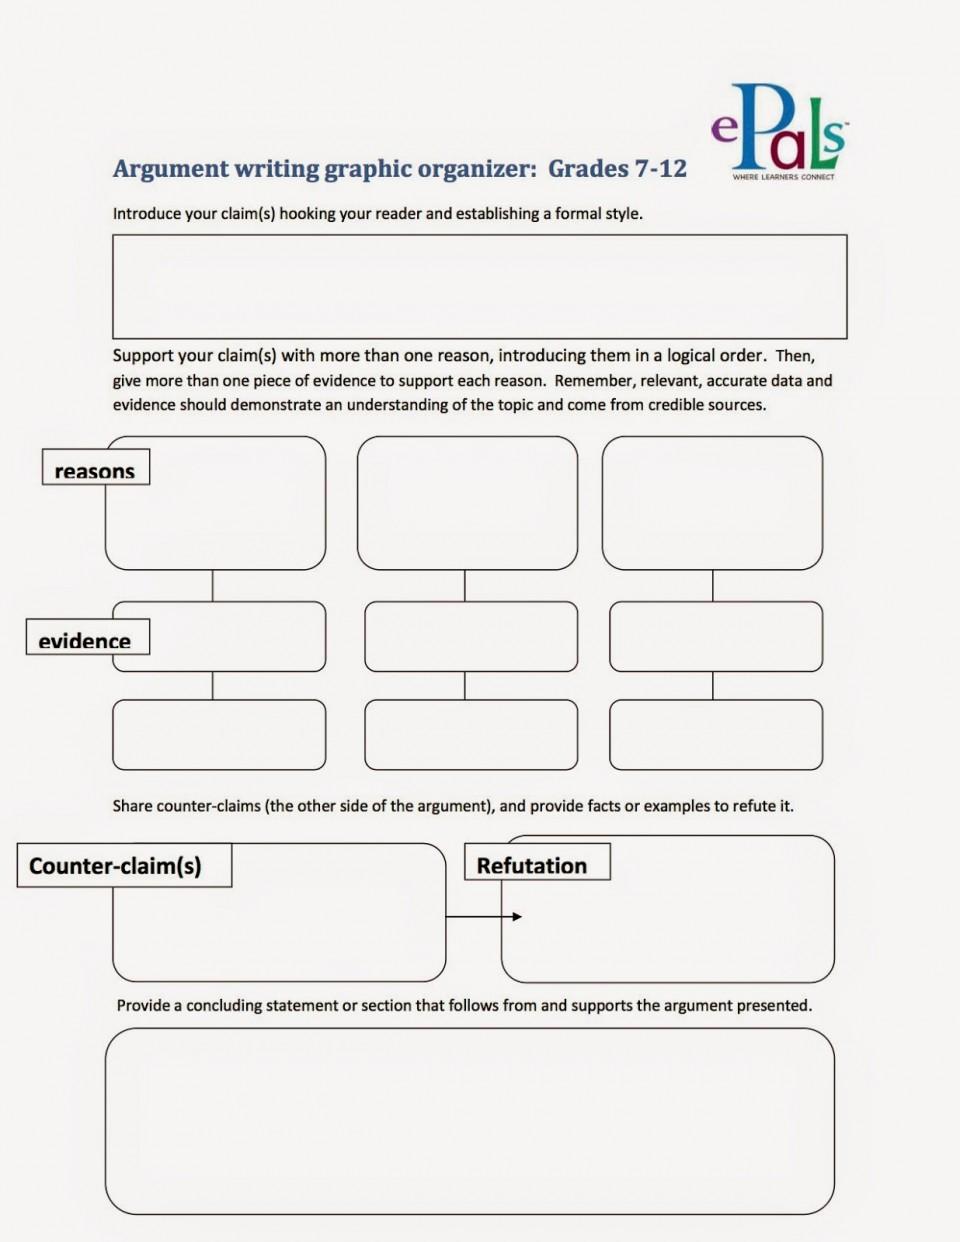 005 Argumentgraphicorganizer2bcopy Argument Essay Graphic Organizer Breathtaking Persuasive Examples Middle School Argumentative Pdf 960